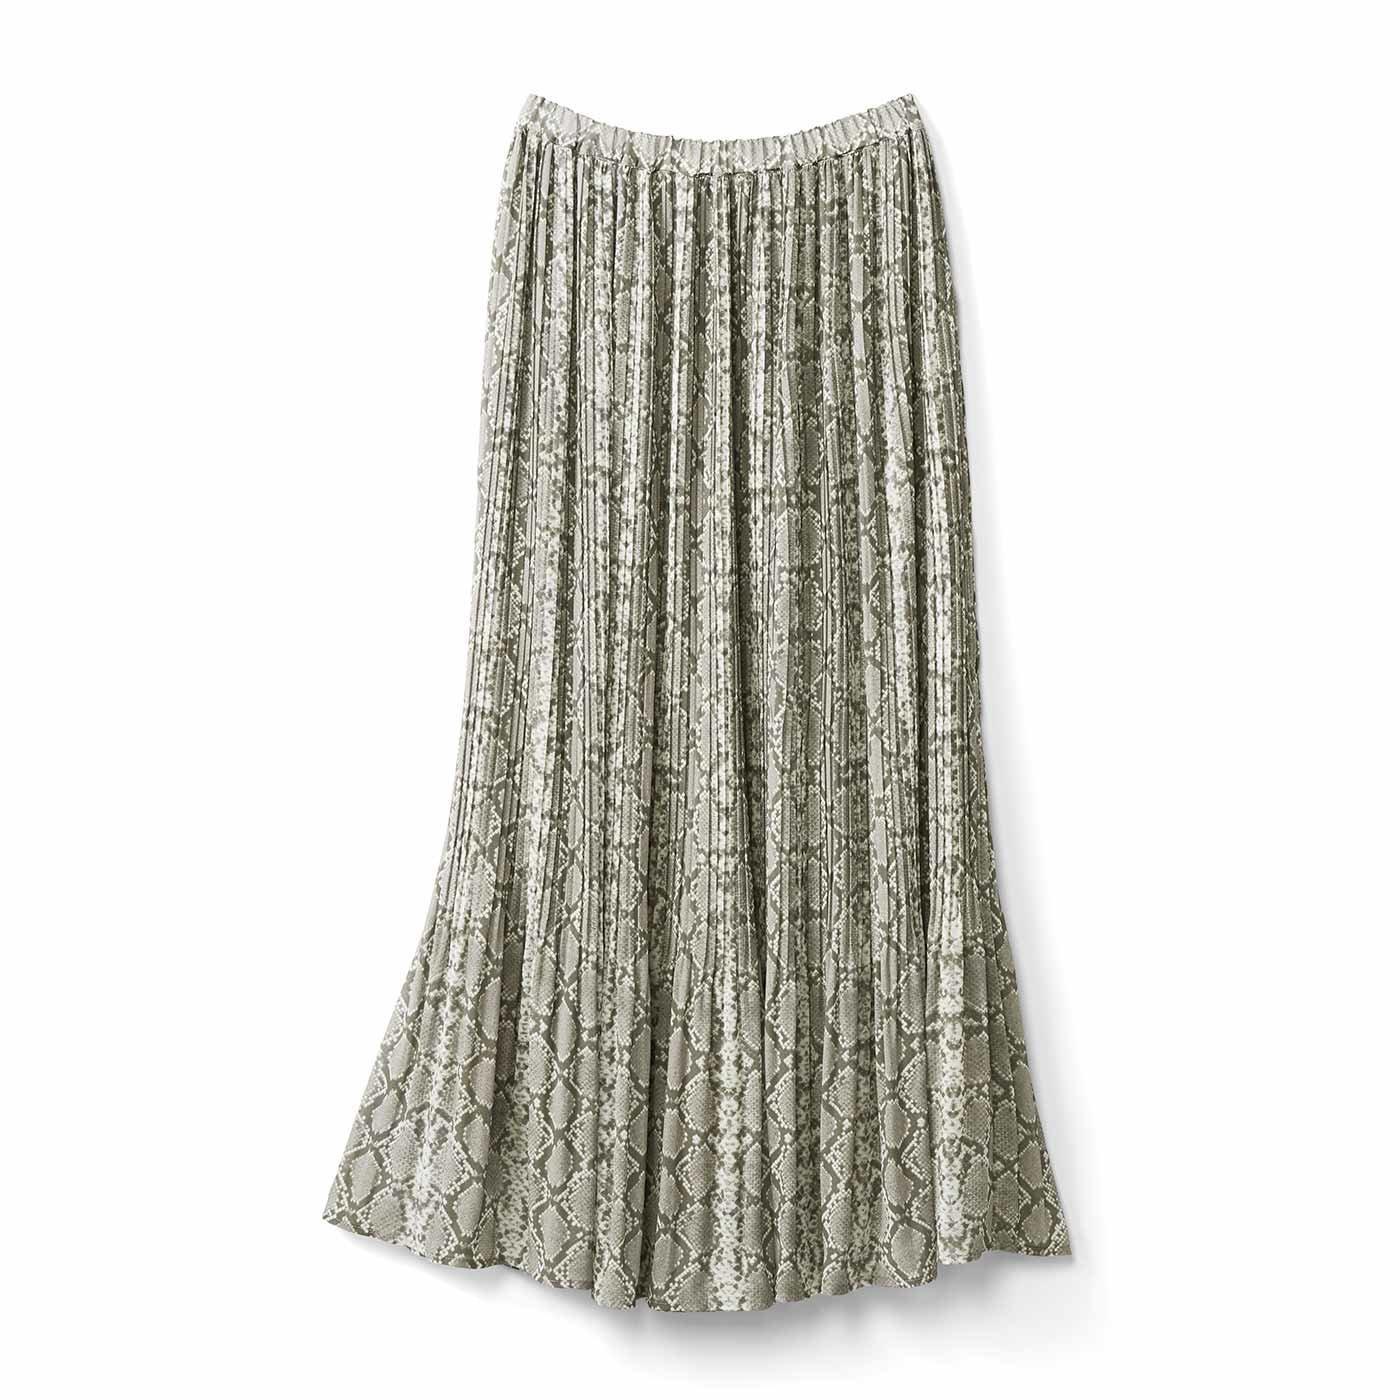 IEDIT[イディット] アニマルプリントの消しプリーツスカート〈グレージュパイソン〉